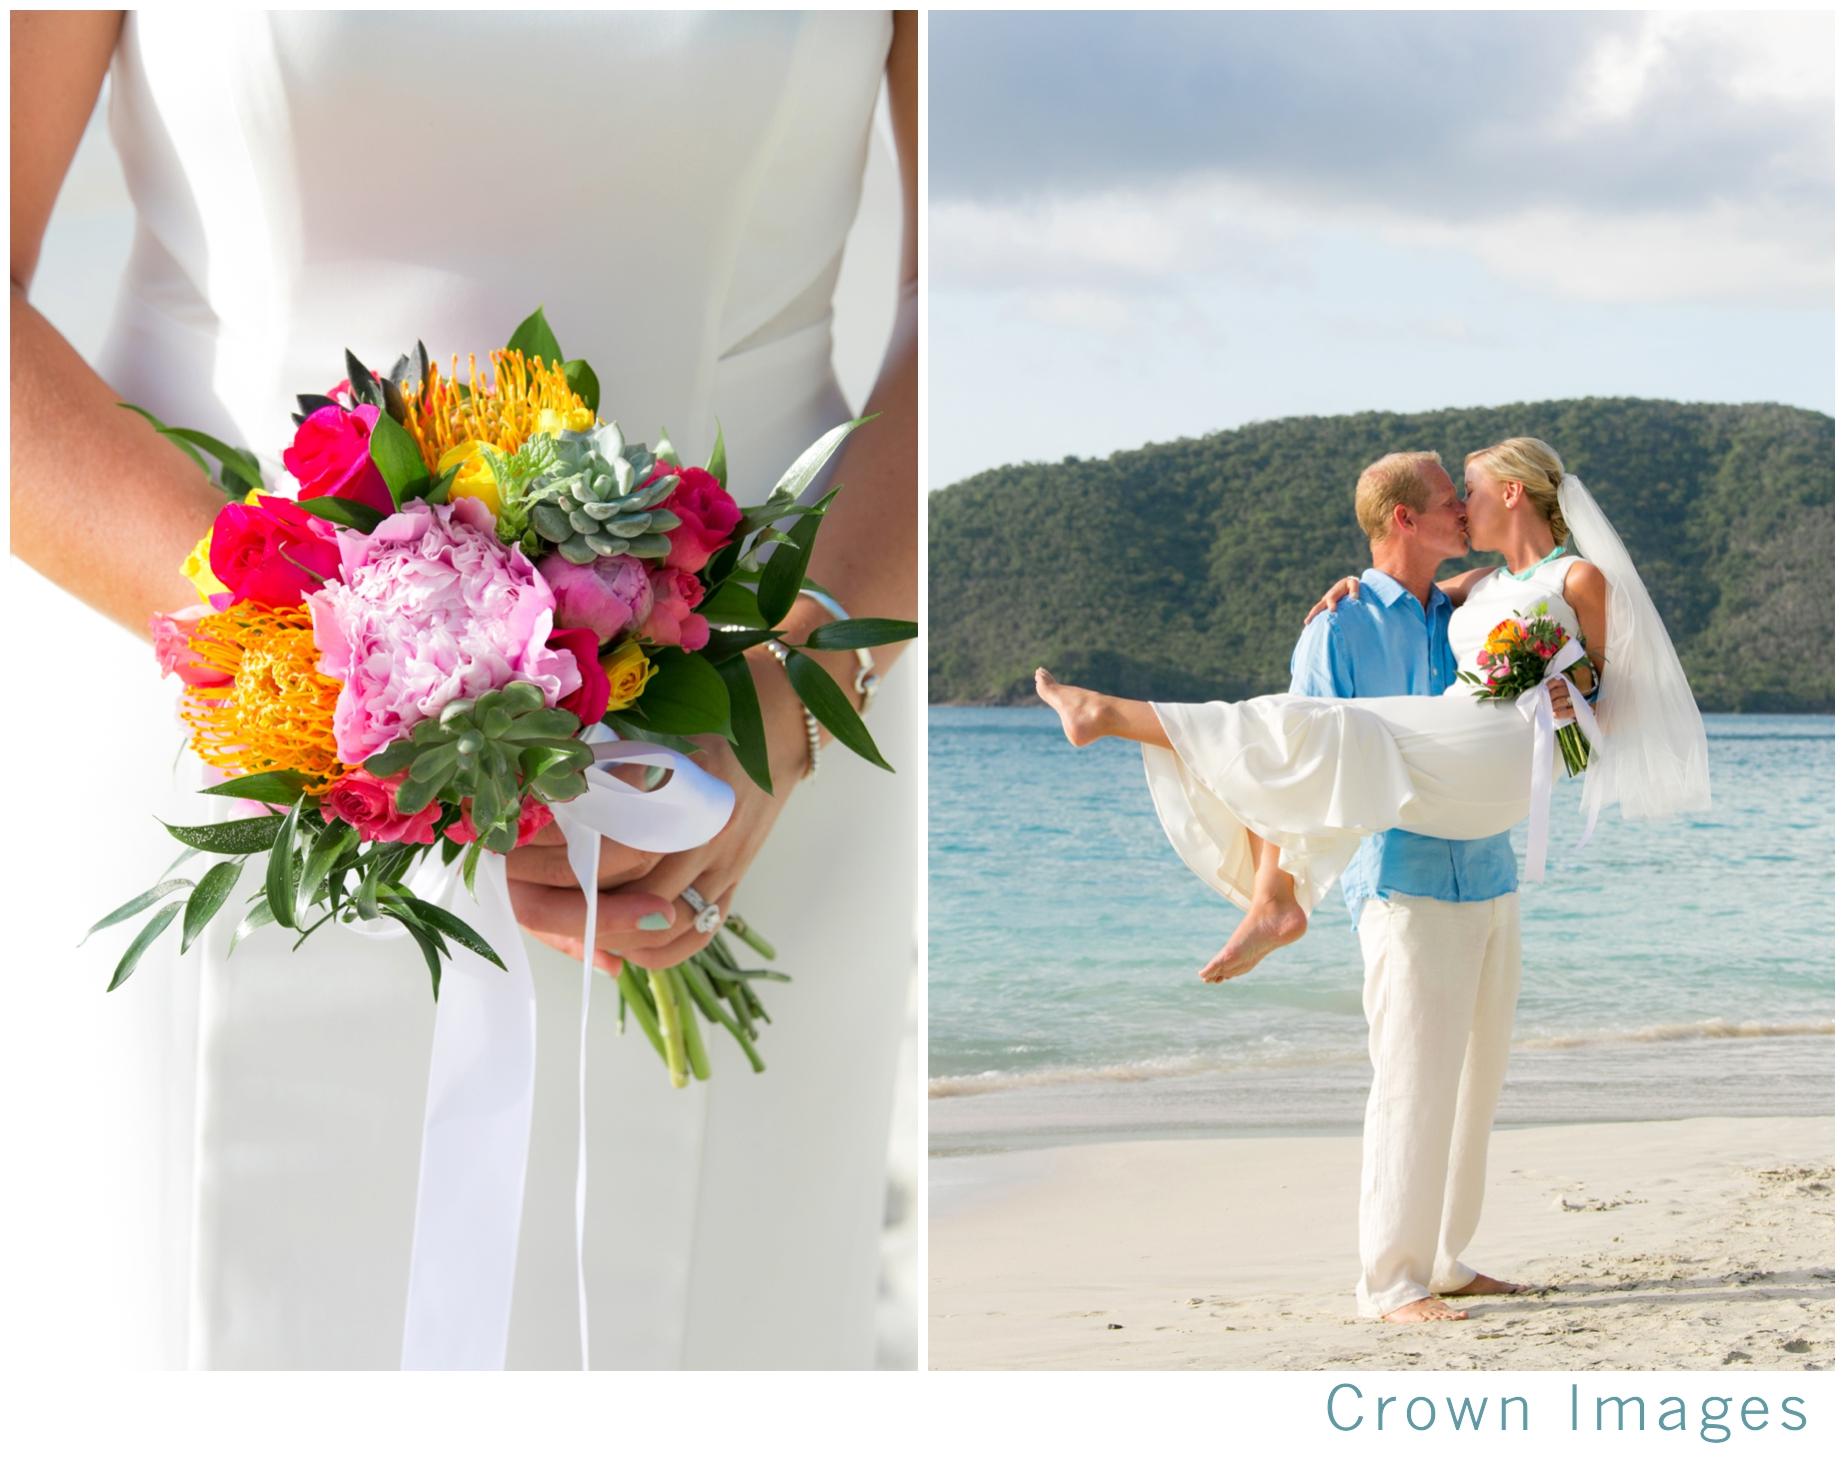 st_john_wedding_photographer_crown_images_0072.jpg